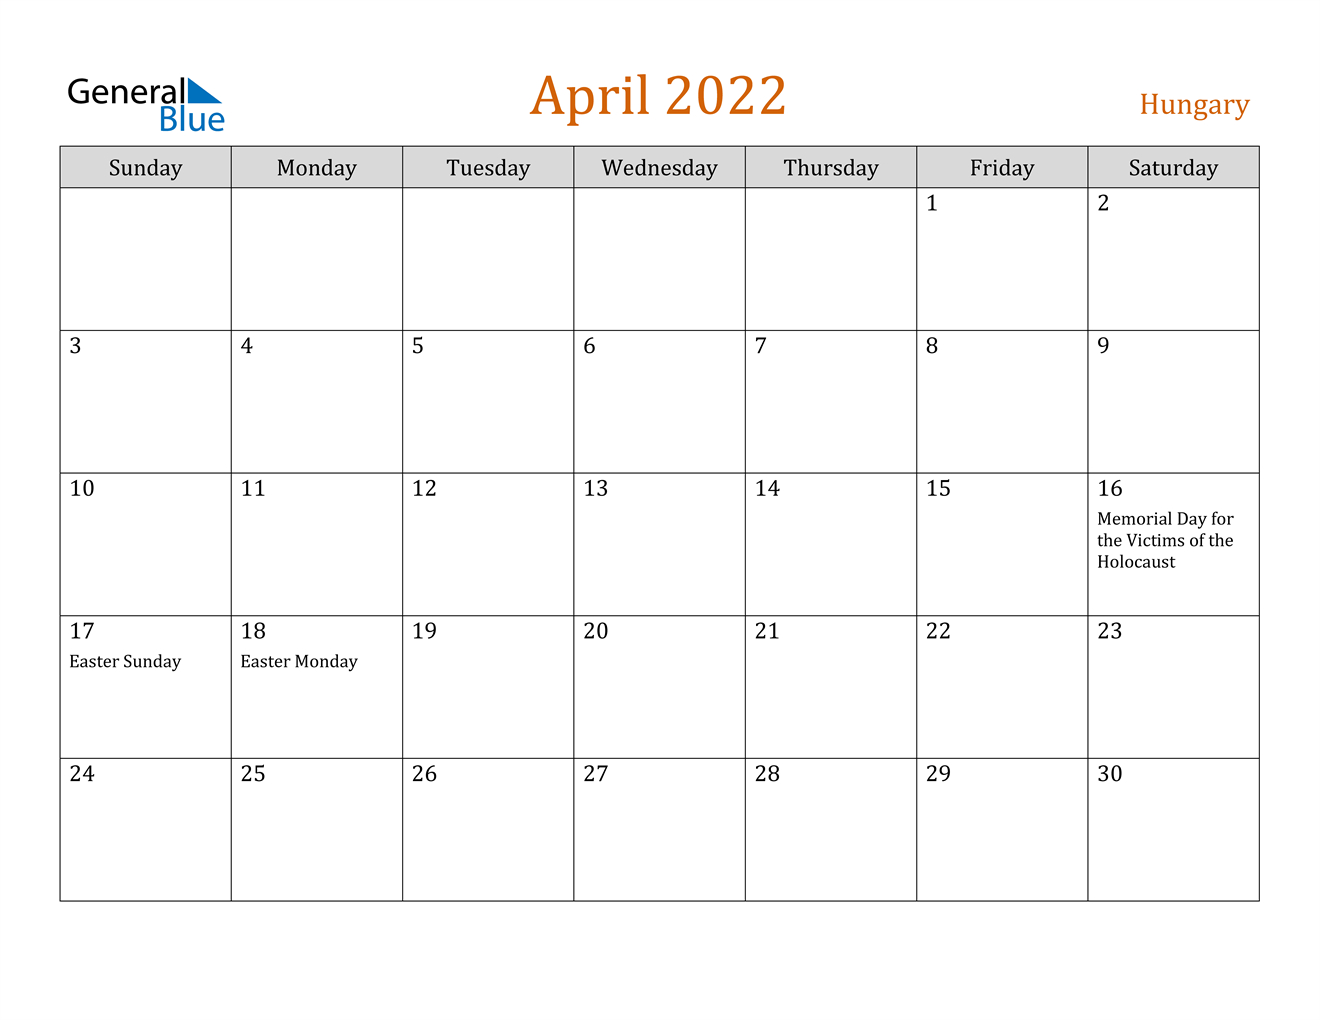 Hungary April 2022 Calendar With Holidays for April 2022 Calendar Printable